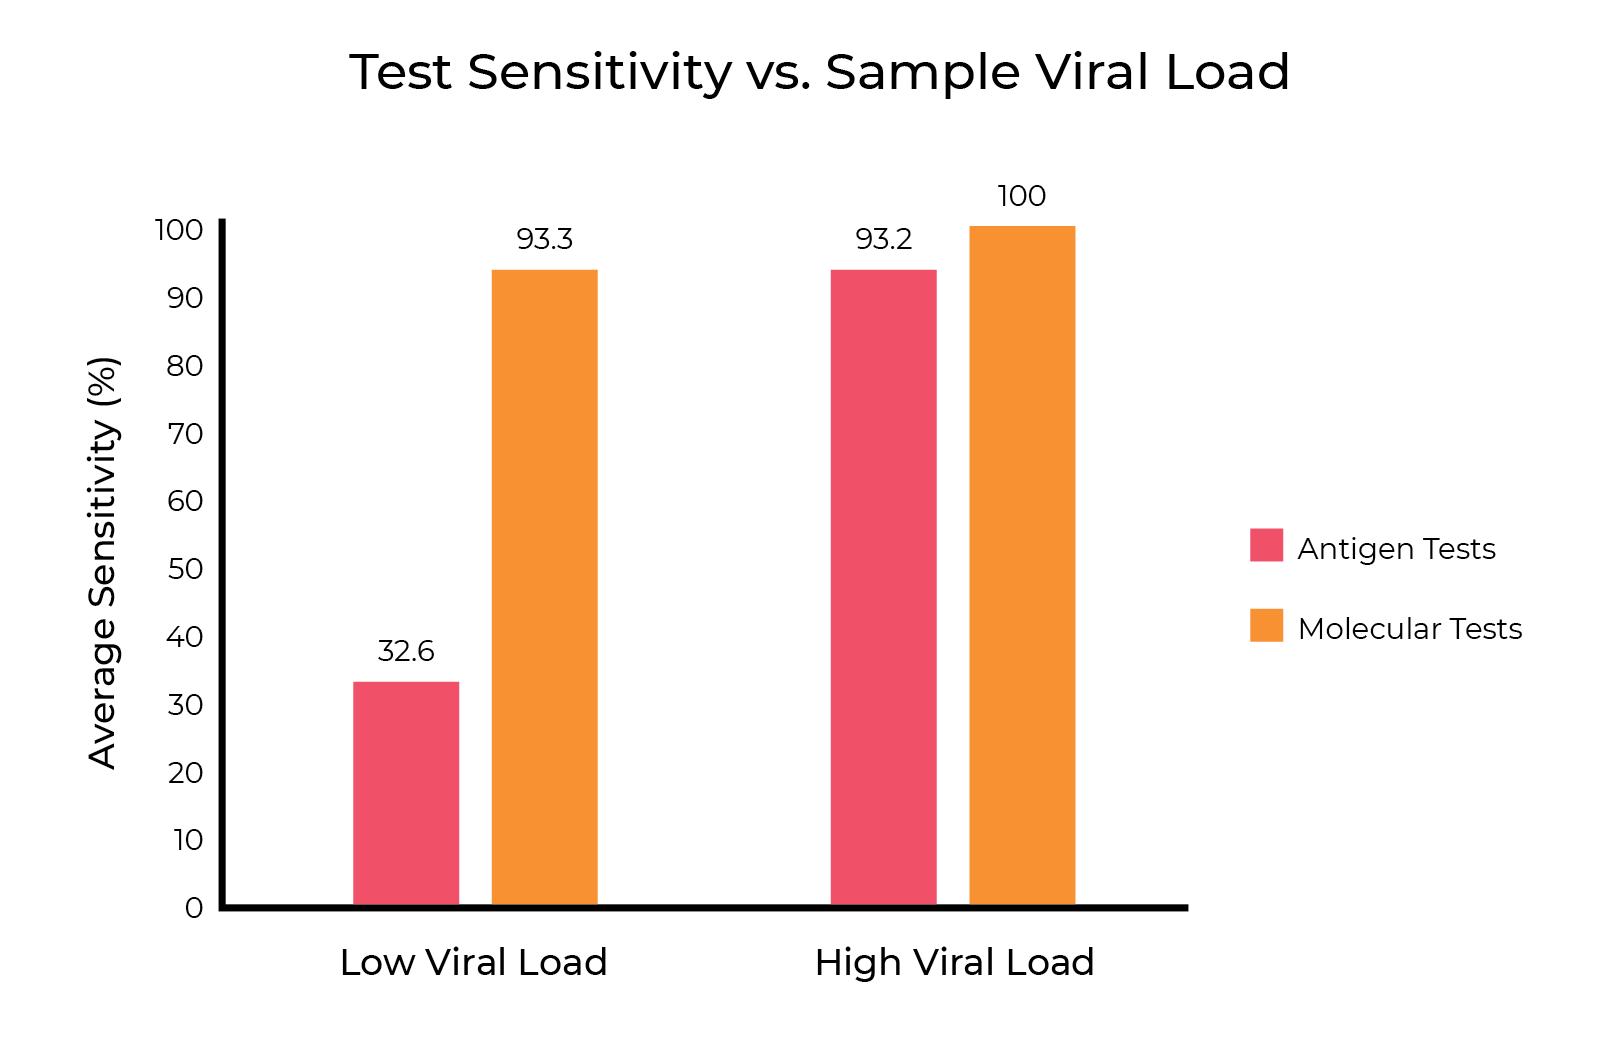 test sensitivity vs. sample viral load bar graph